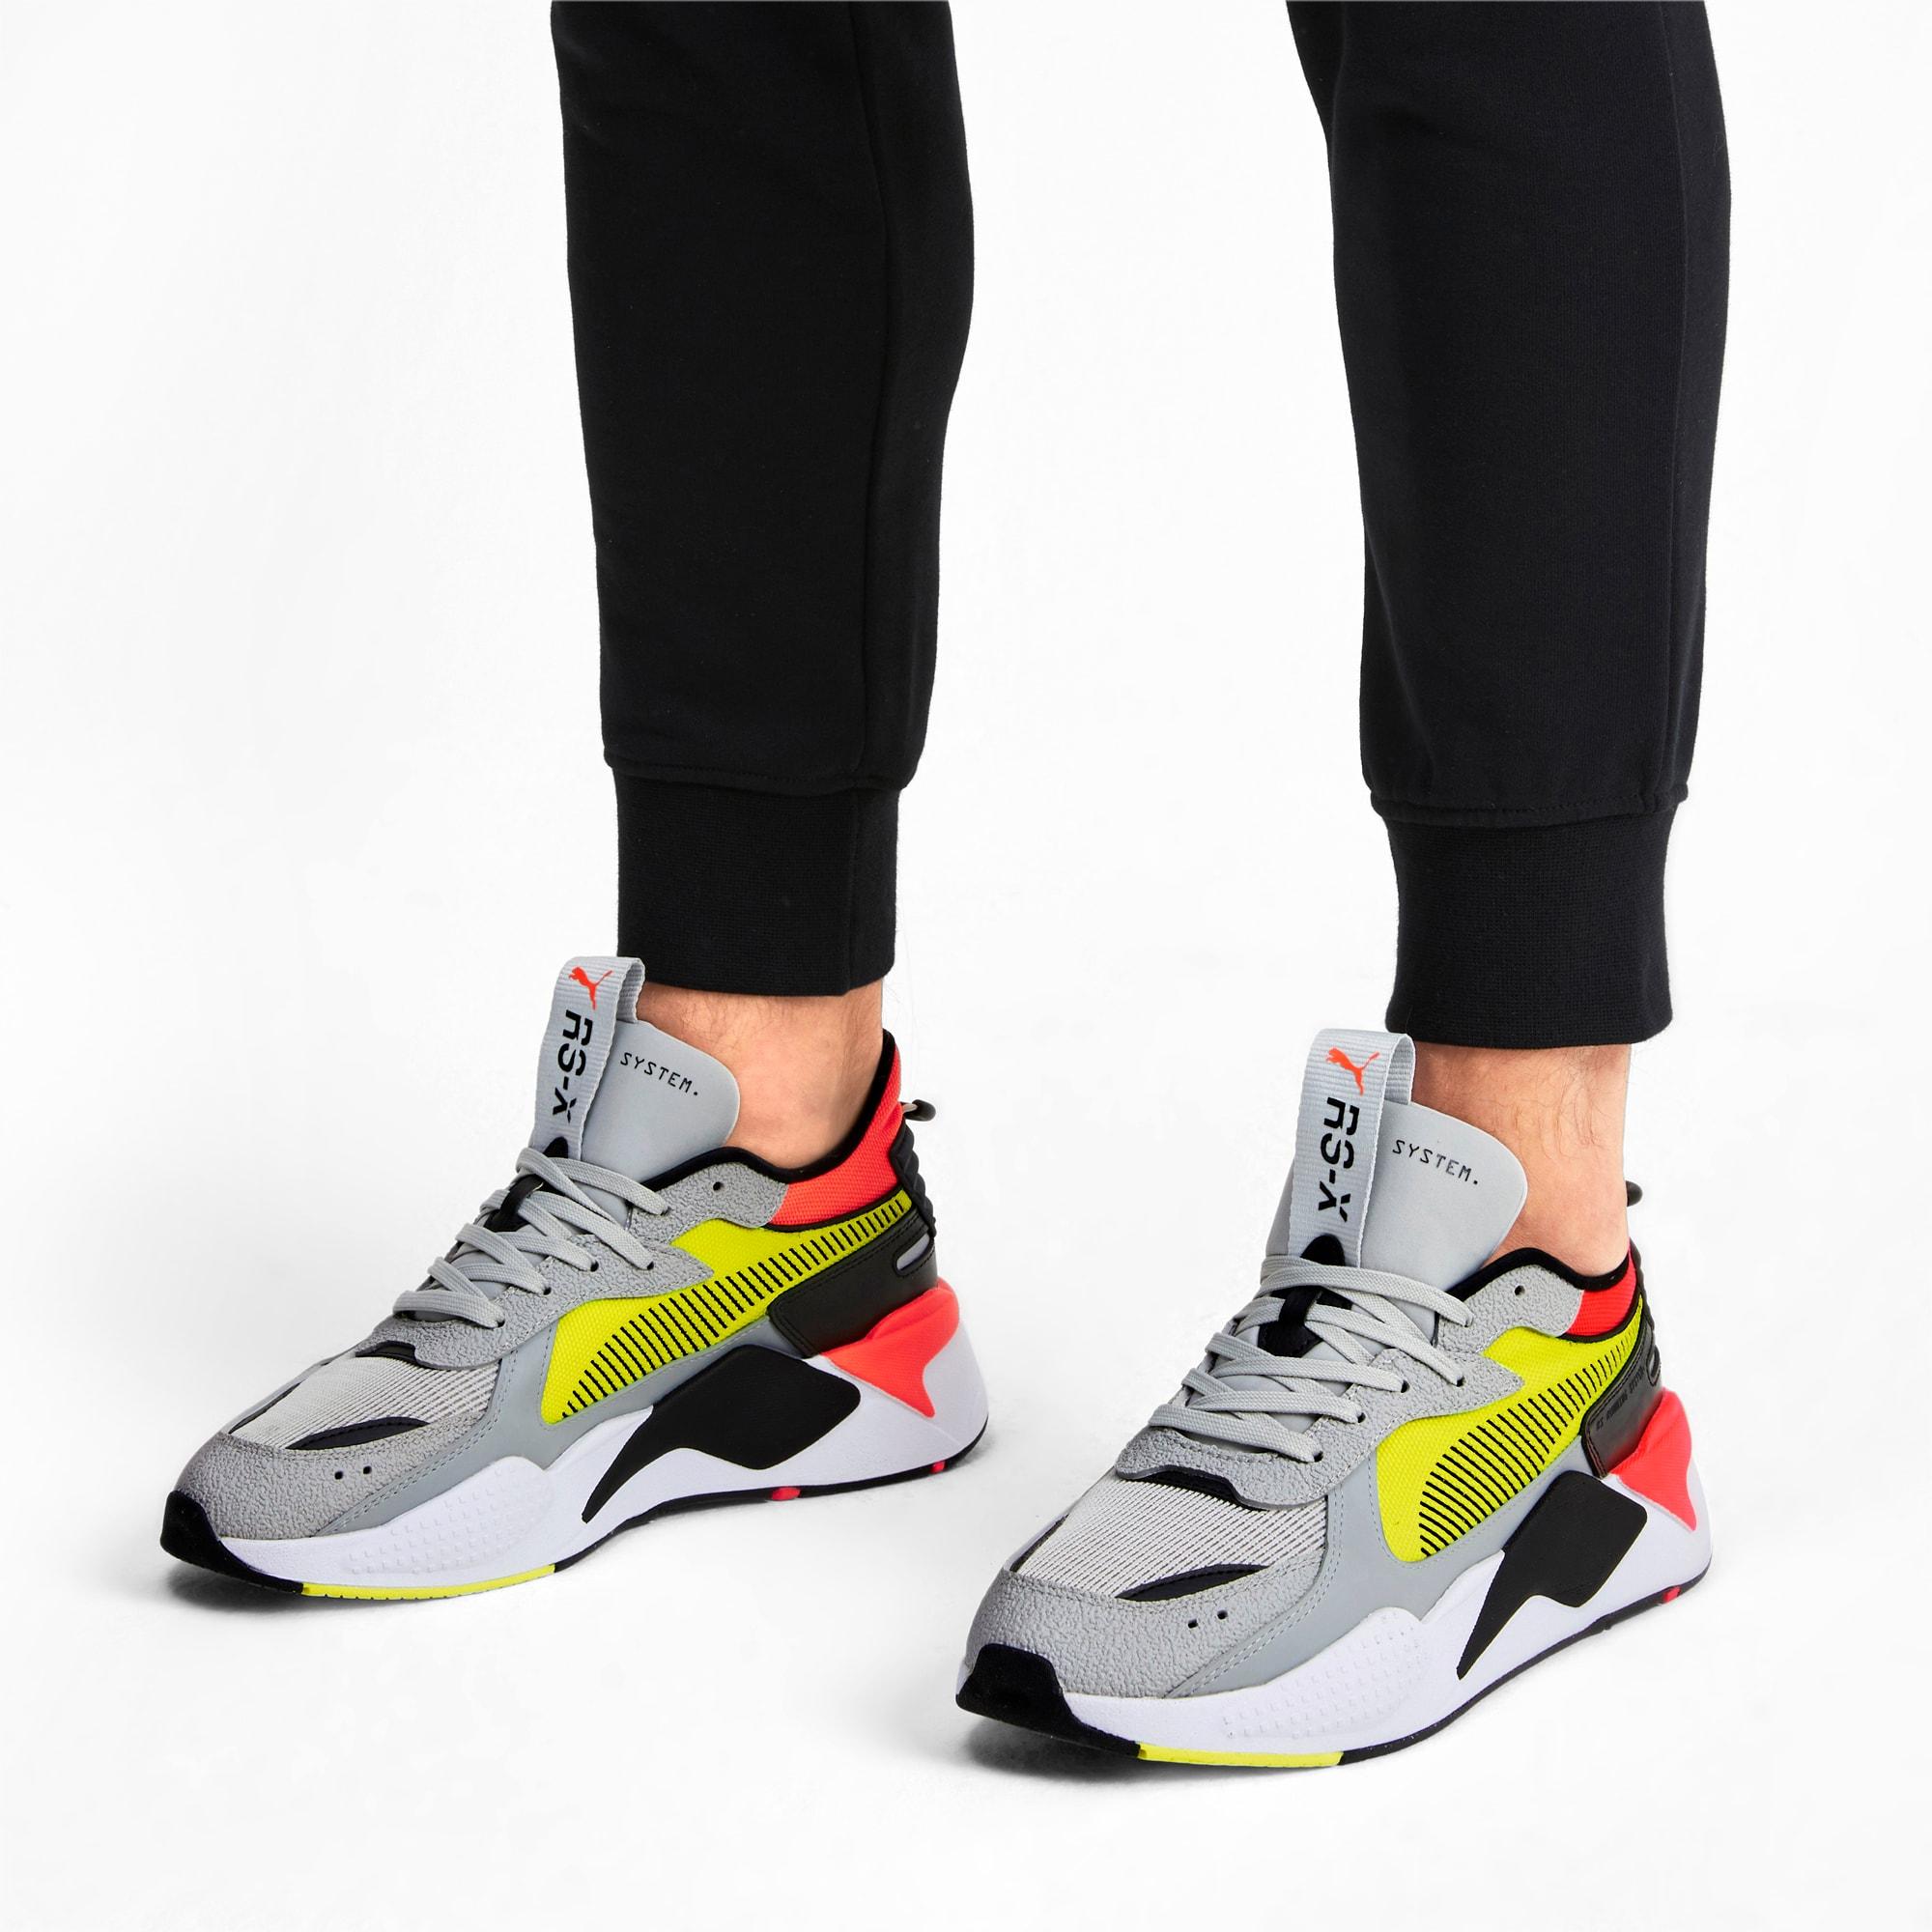 RS-X Hard Drive Men's Sneakers